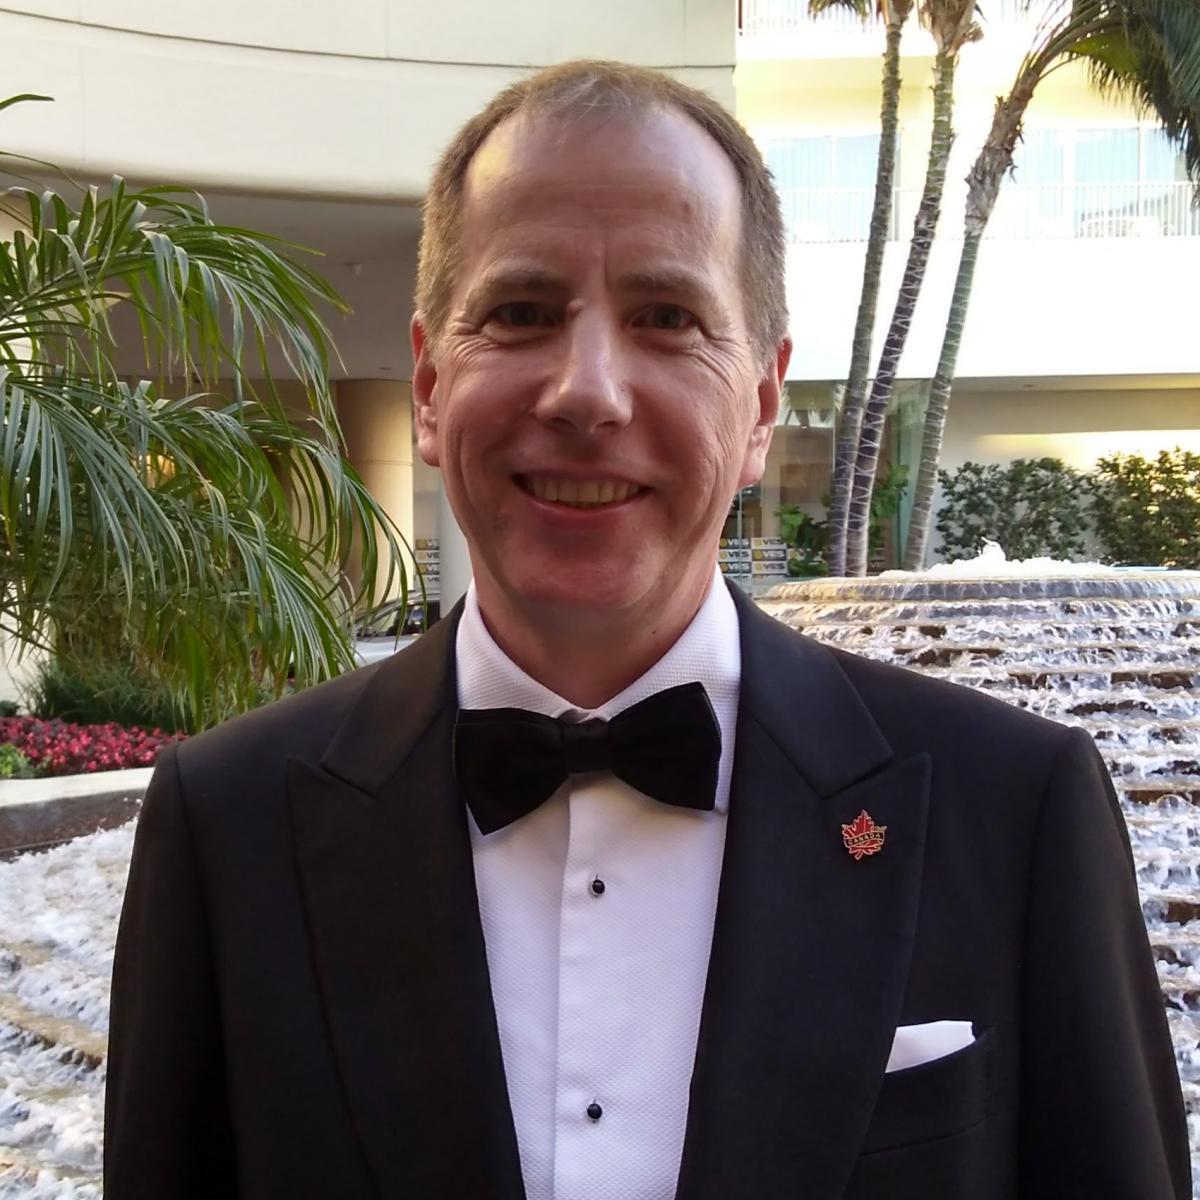 Mark Elendt